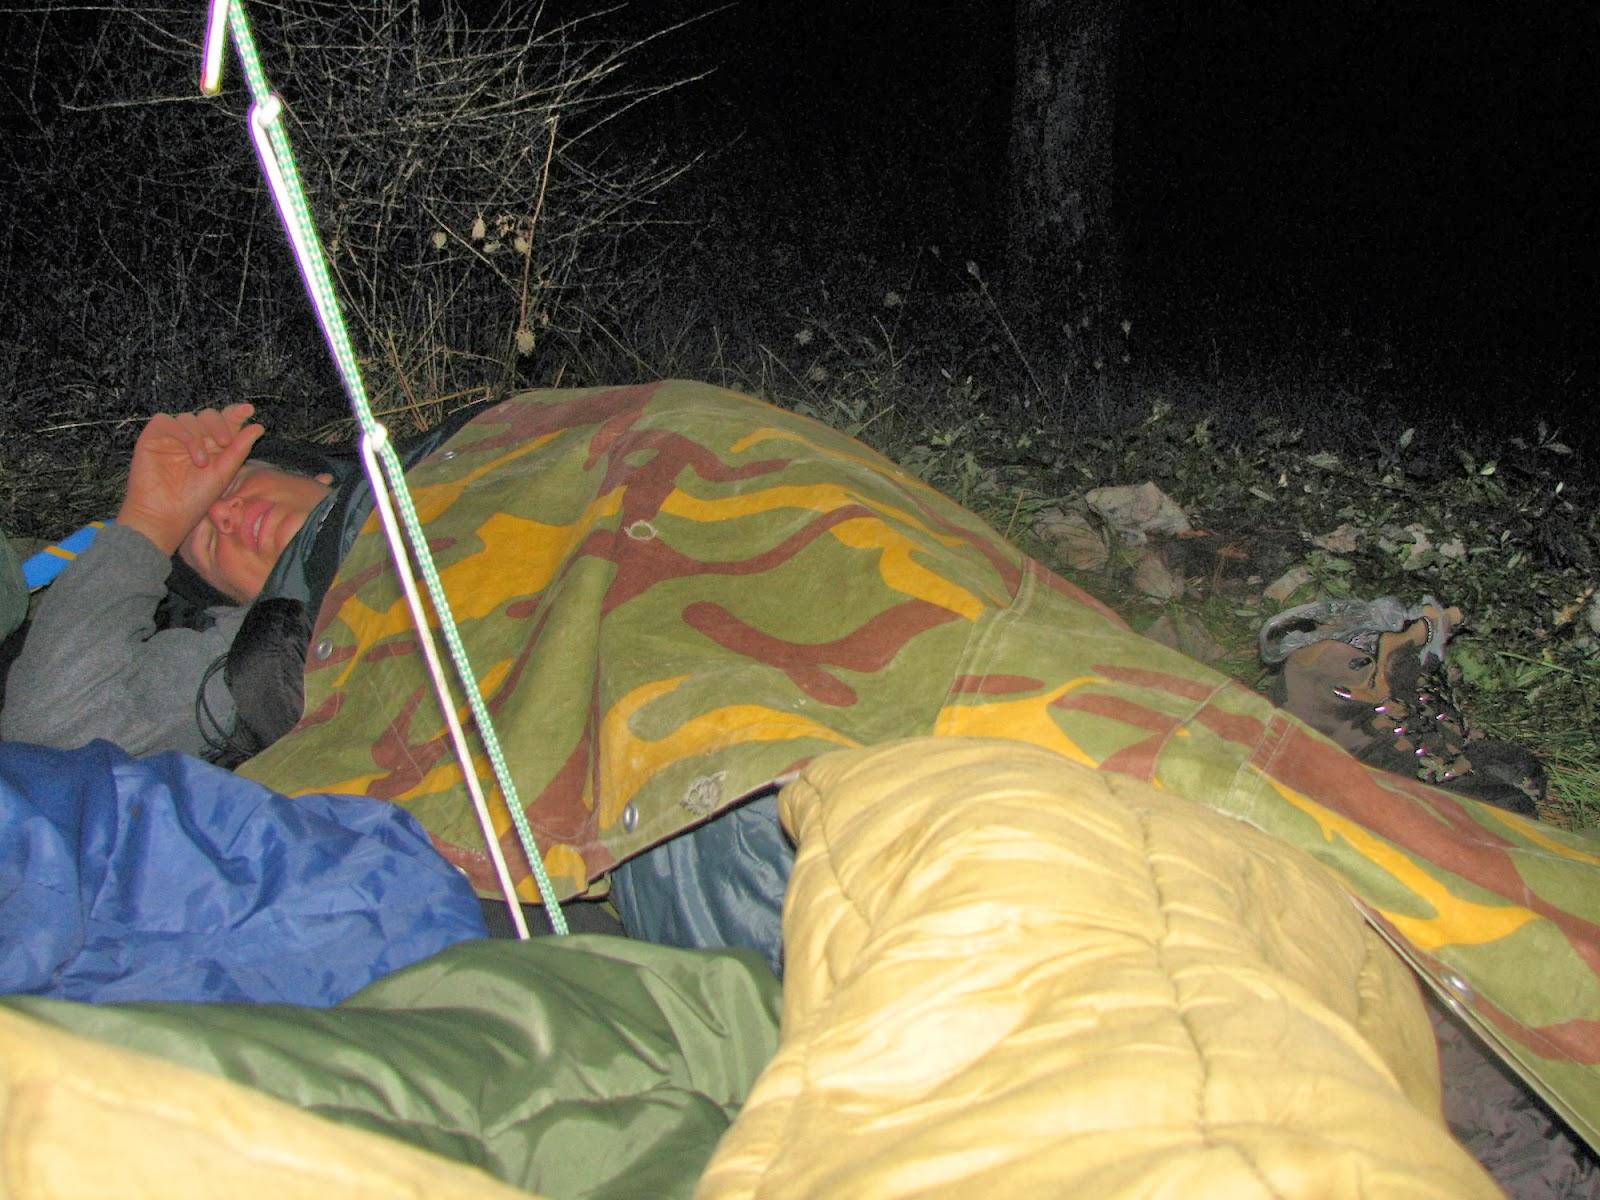 Prehod PP, Ilirska Bistrica 2005 - picture%2B099.jpg